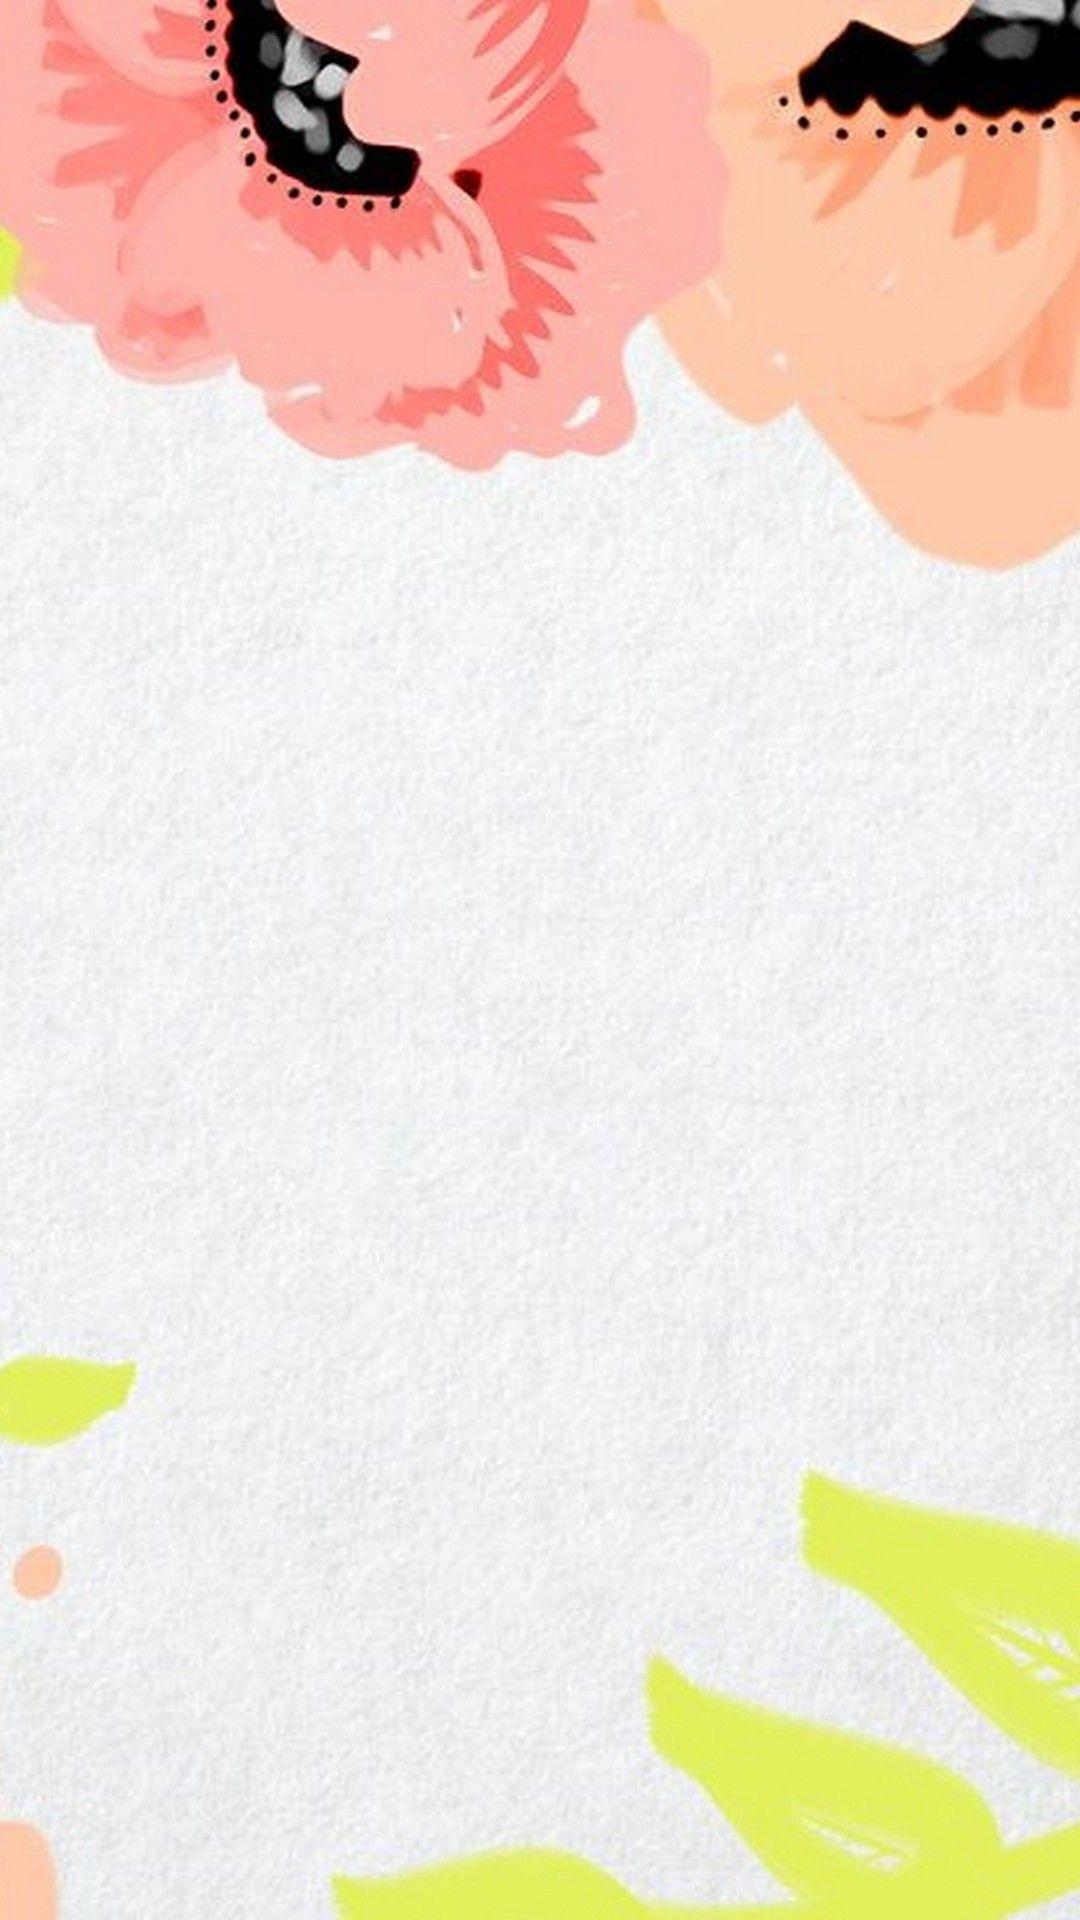 Cute Iphone 7 Wallpaper Hd Best Phone Wallpaper Iphone Wallpaper Hd Cute Iphone Wallpaper Wallpaper Iphone Cute